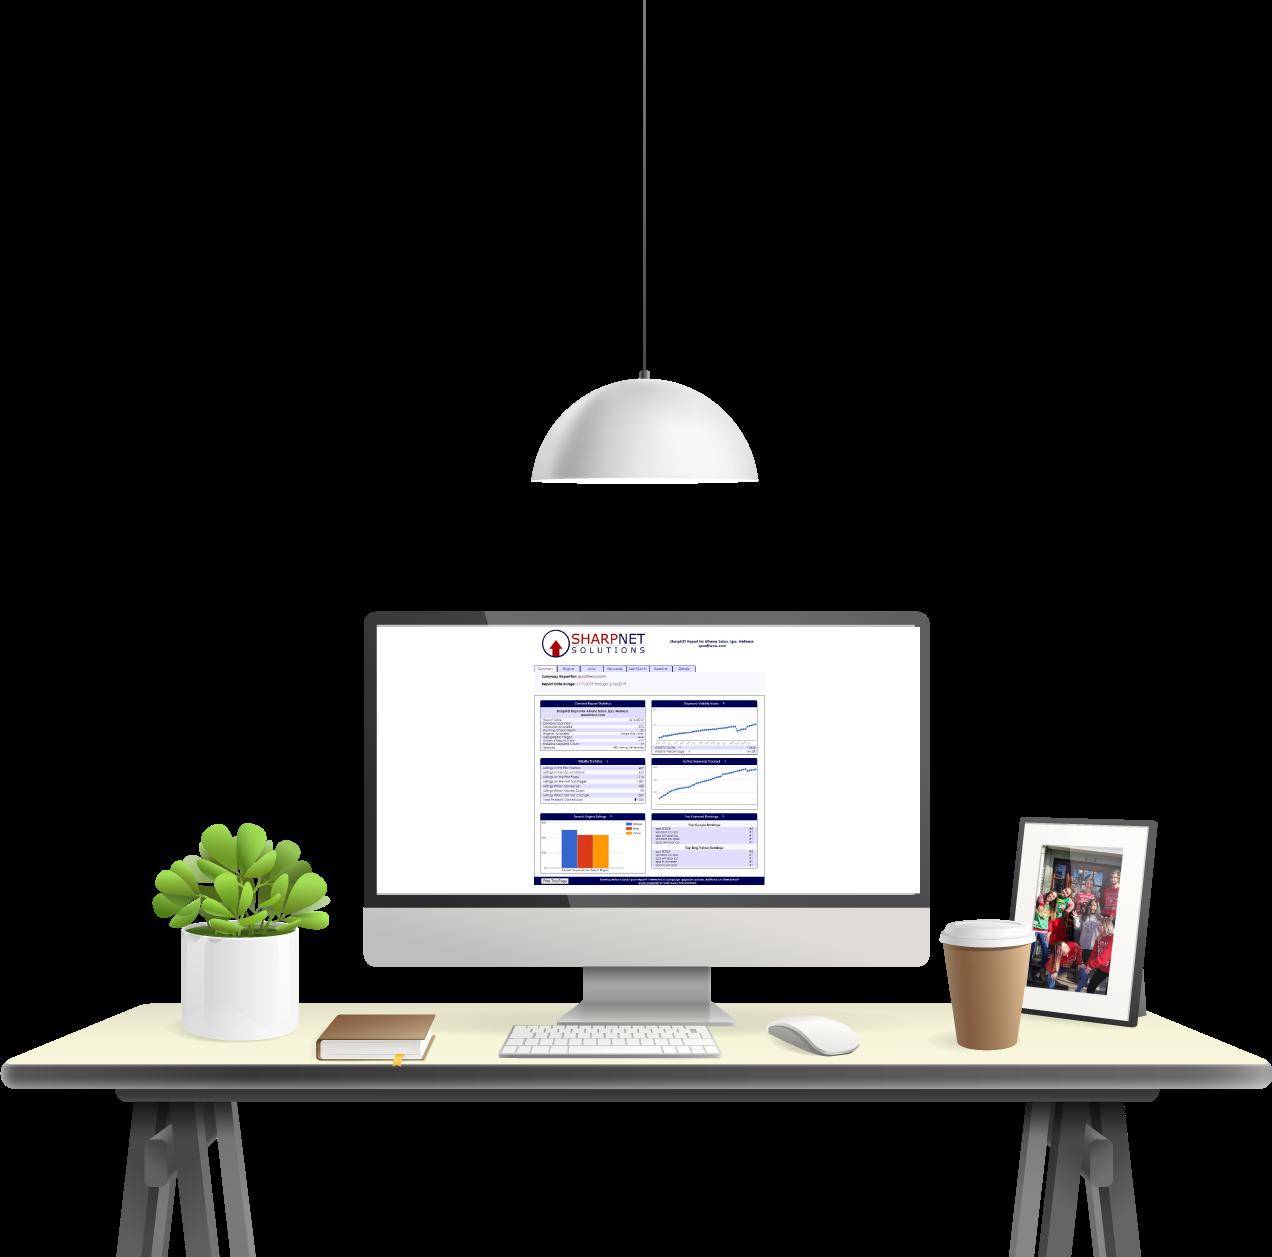 White Label Digital Marketing Partners: SEO, PPC & Website